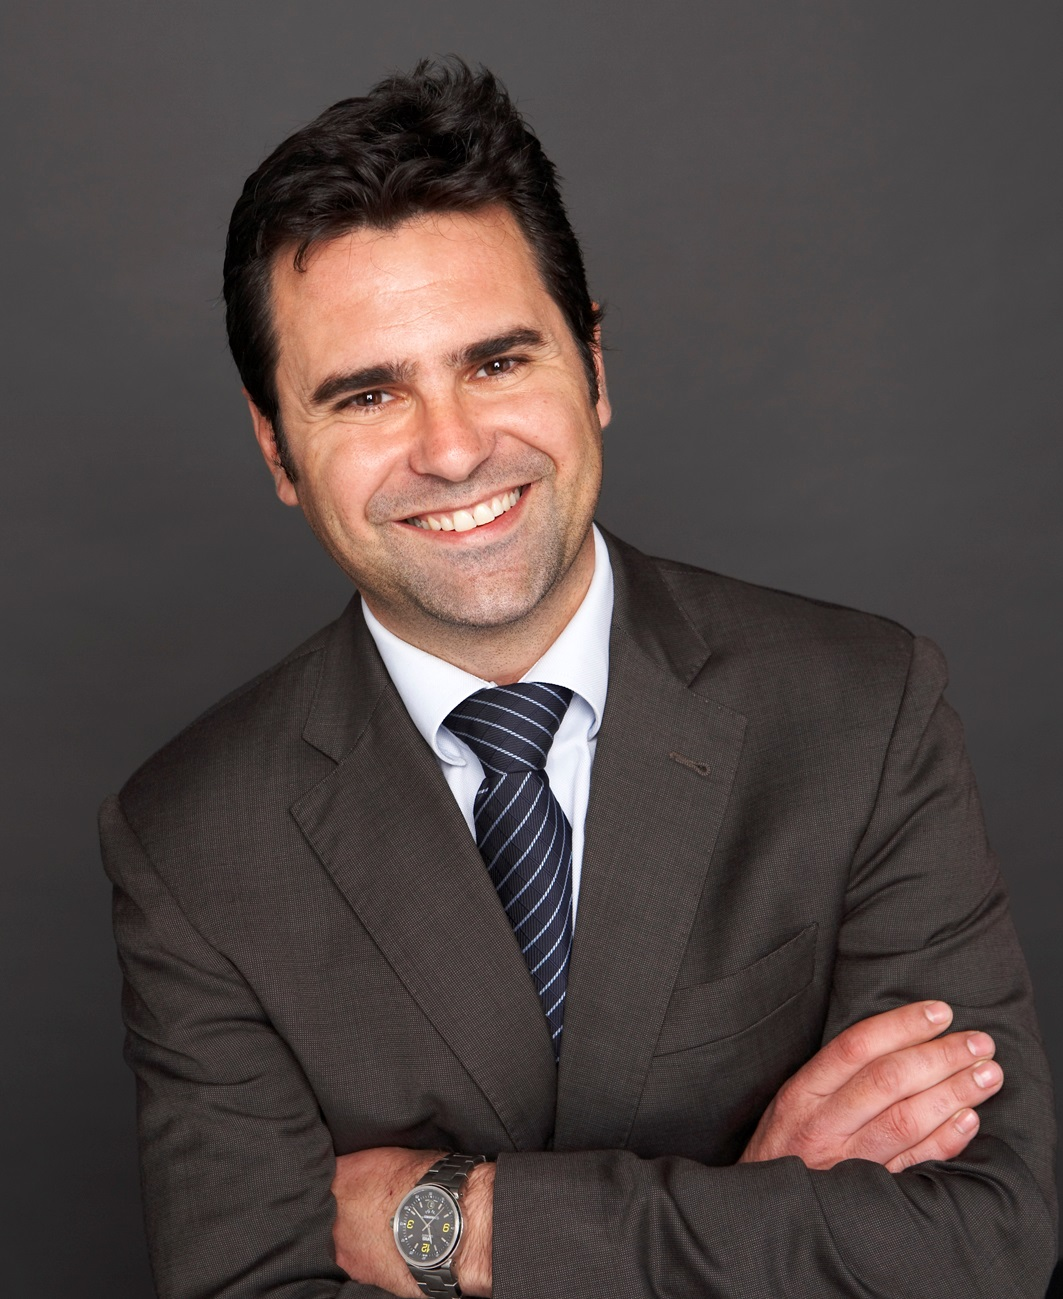 DAVID BERNALDO DE QUIROS